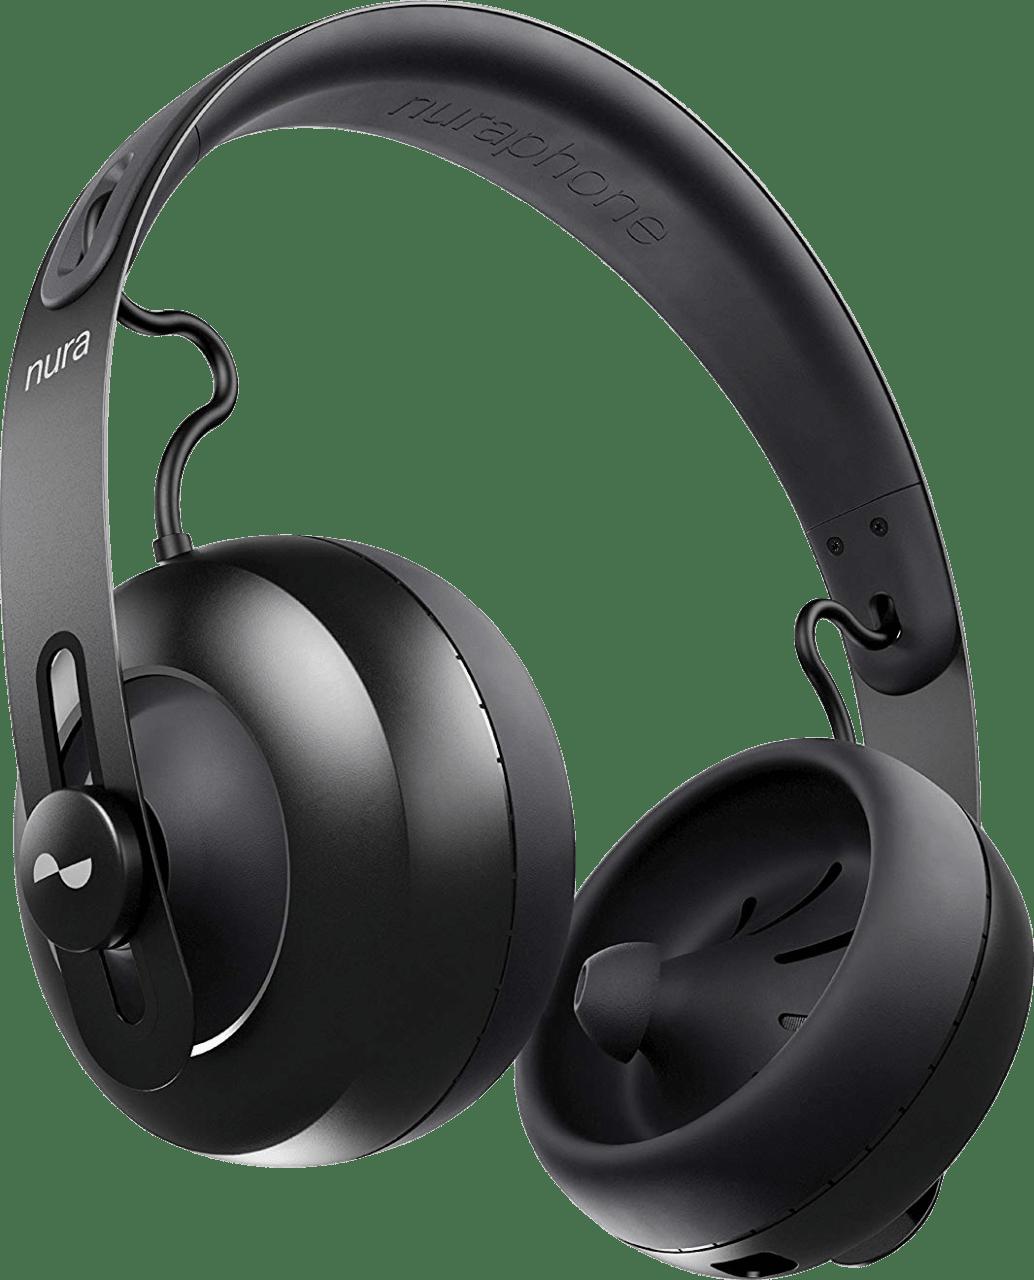 Black Nura Nuraphones Noise-Canceling Noise-cancelling Over-ear Bluetooth Headphones.3